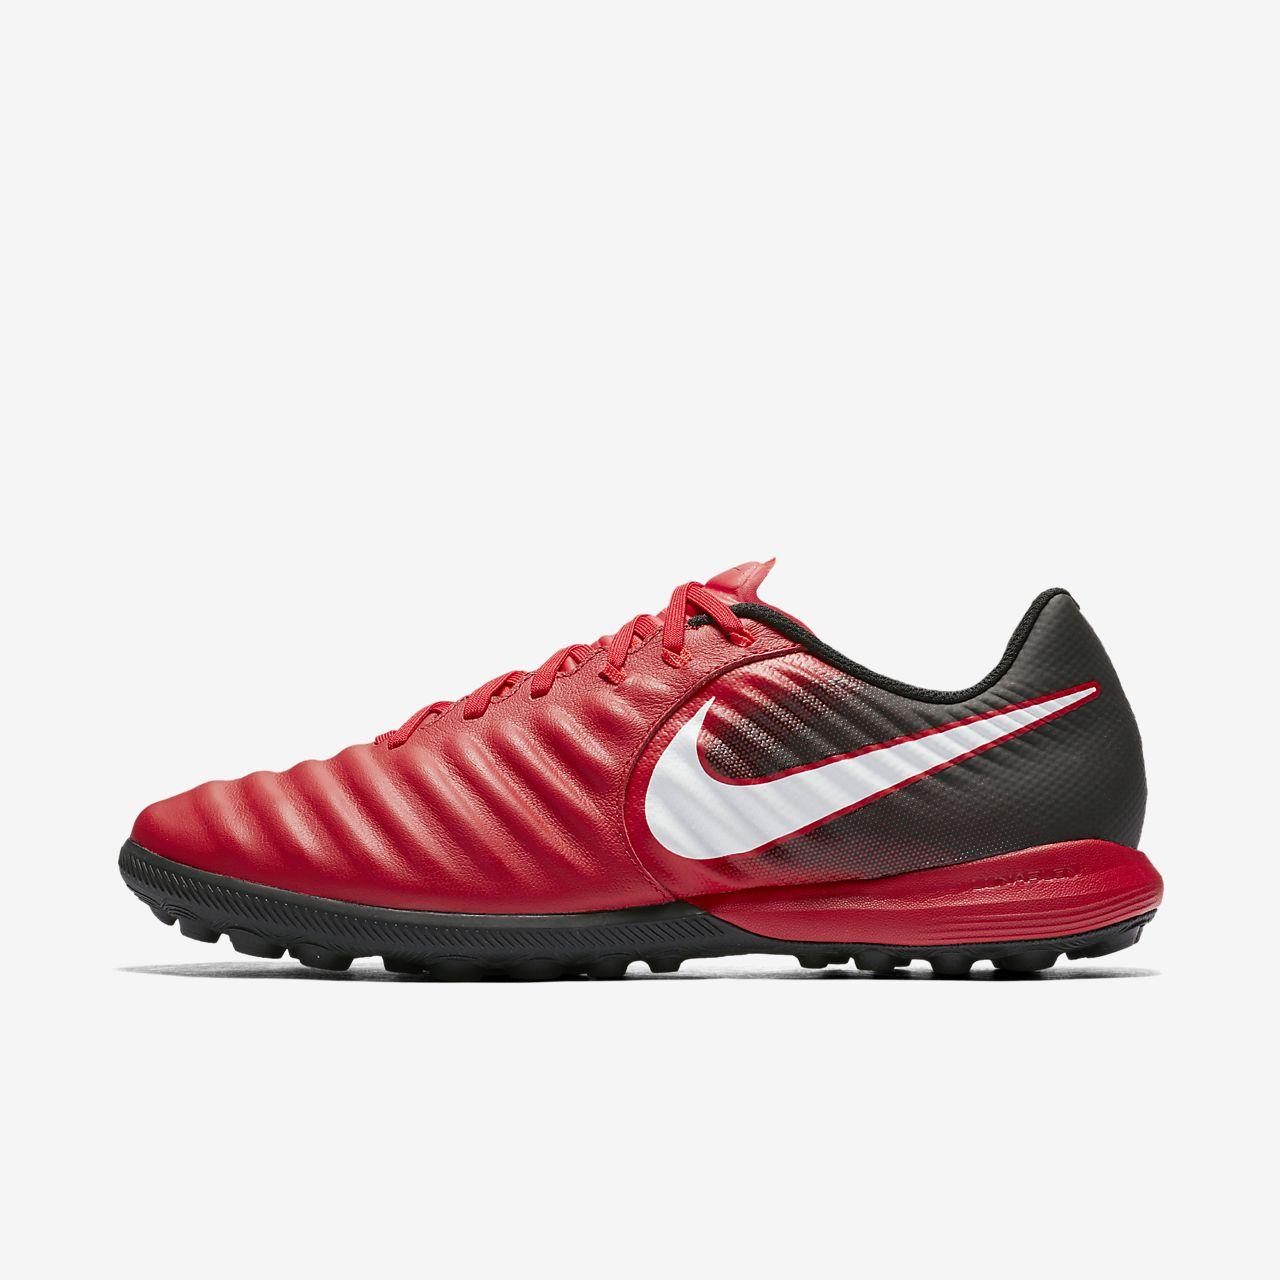 ... Nike TiempoX Finale Artificial-Turf Football Shoe